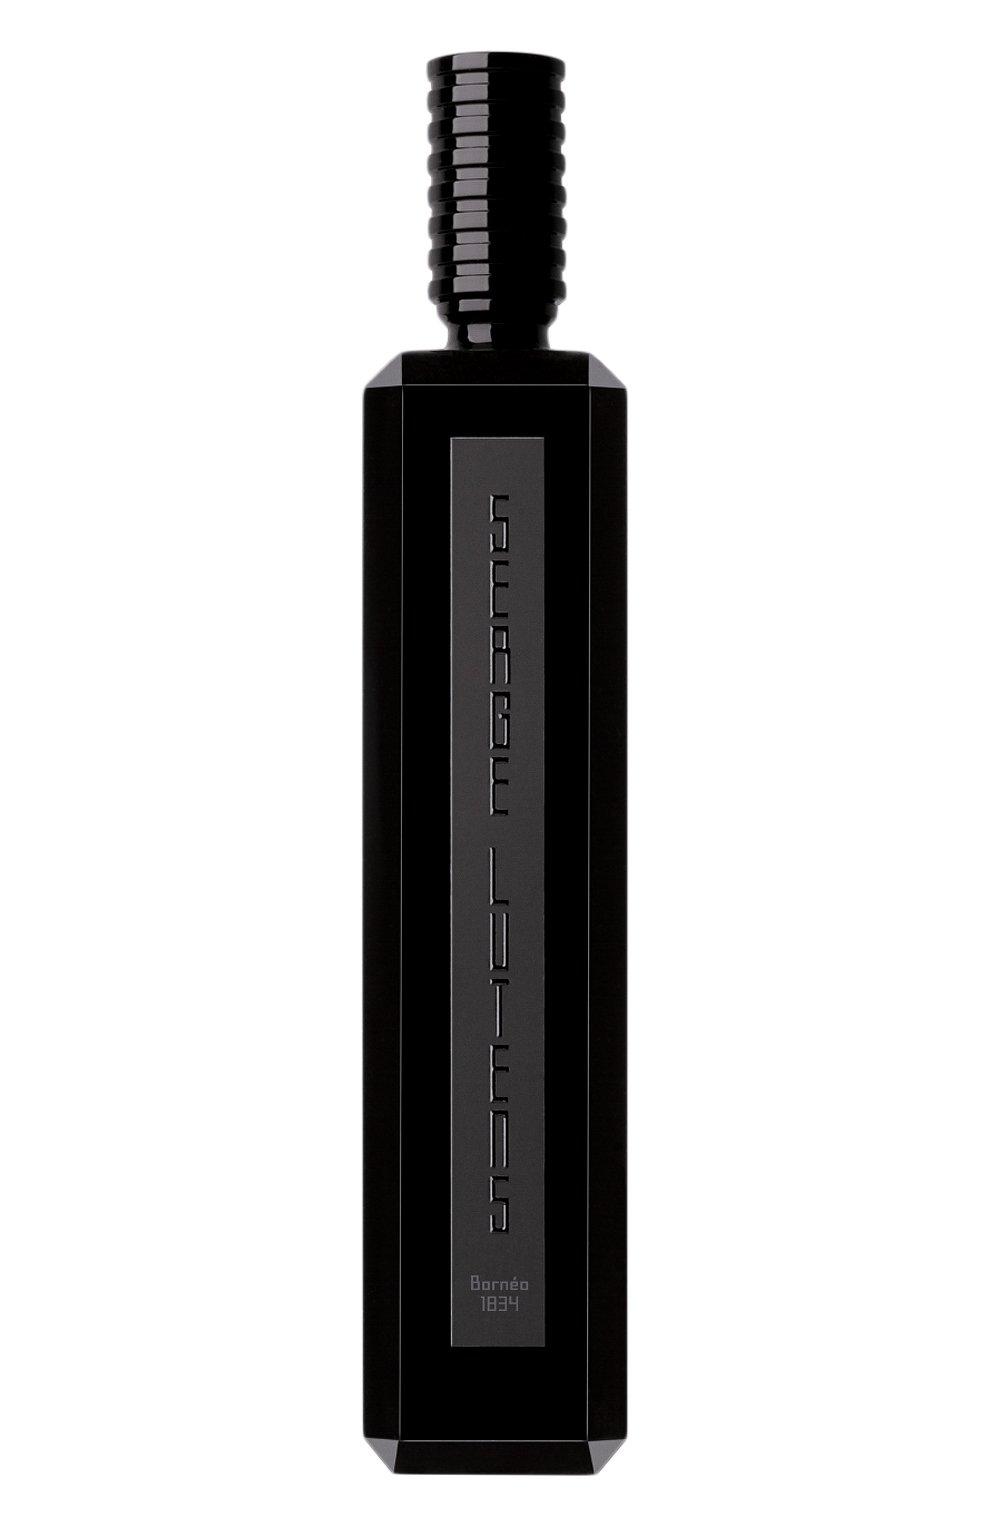 Парфюмерная вода borneo 1834 (100ml) SERGE LUTENS бесцветного цвета, арт. 3700358123778   Фото 1 (Статус проверки: Проверена категория; Ограничения доставки: flammable)